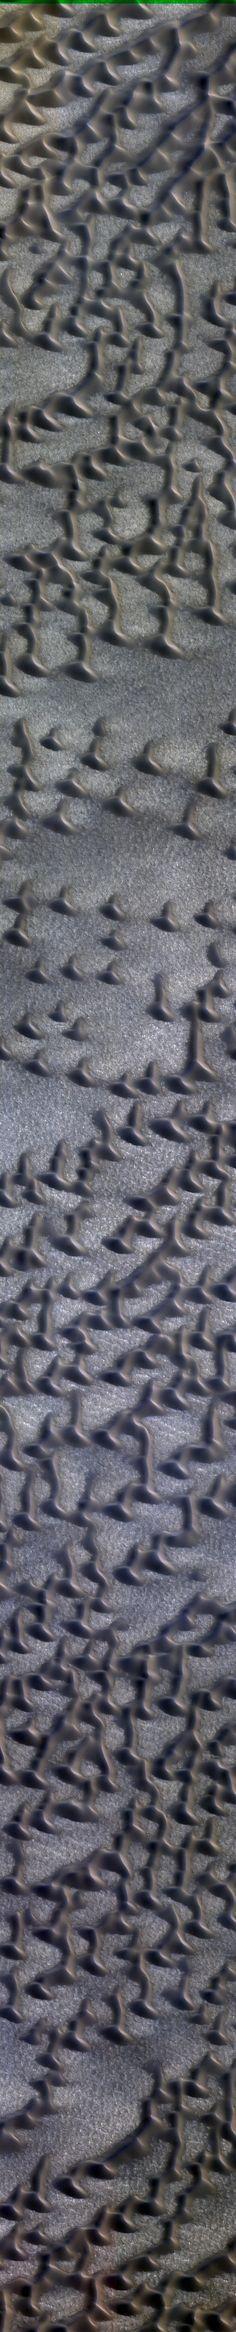 NASA/JPL/University of Arizona Furrows on Dunes HIRISE Mars